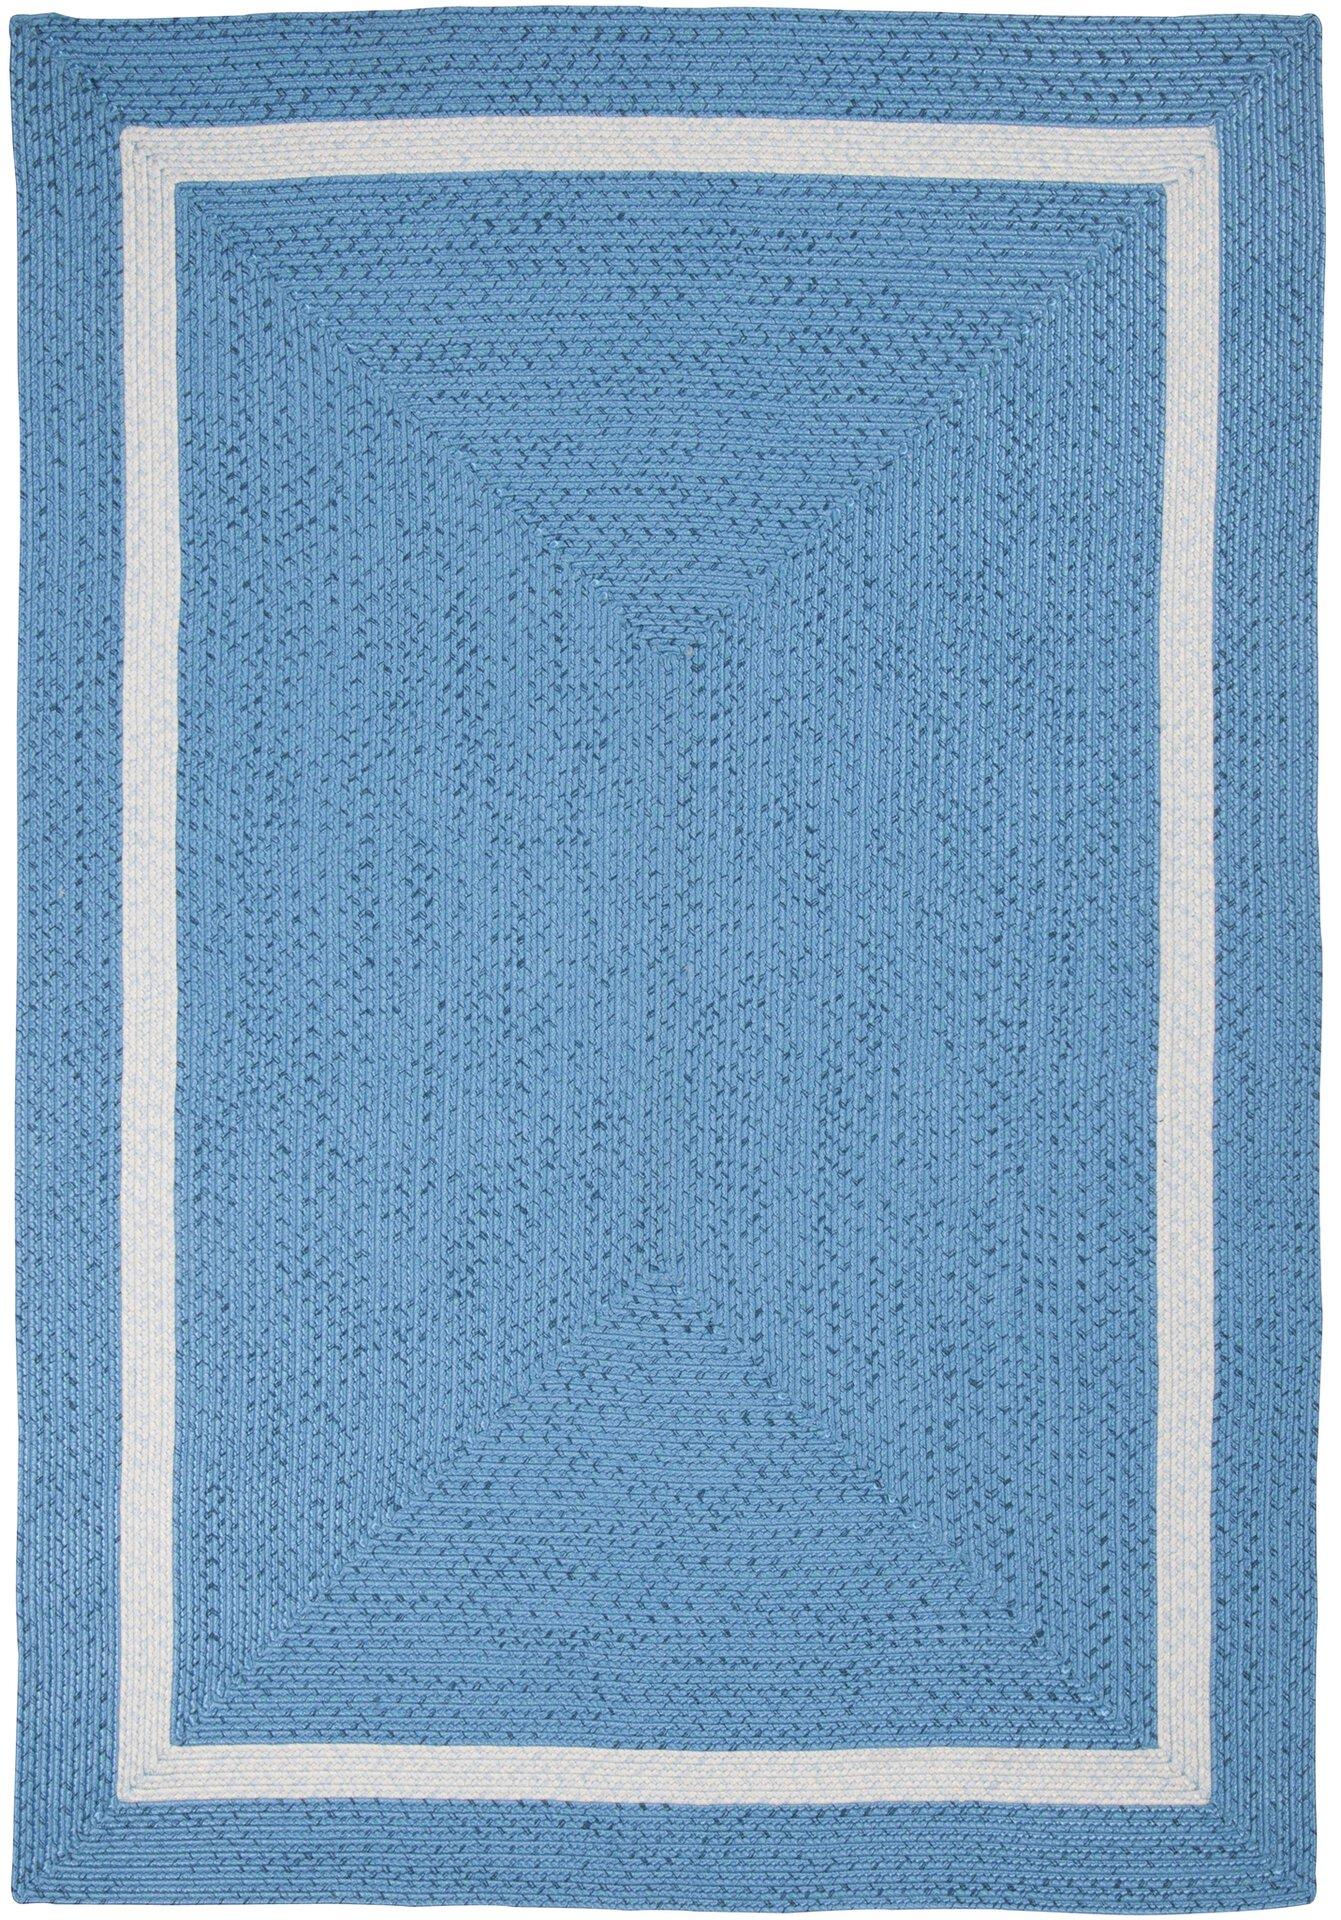 Handwebteppich Benito Gino Falcone Textil Blau